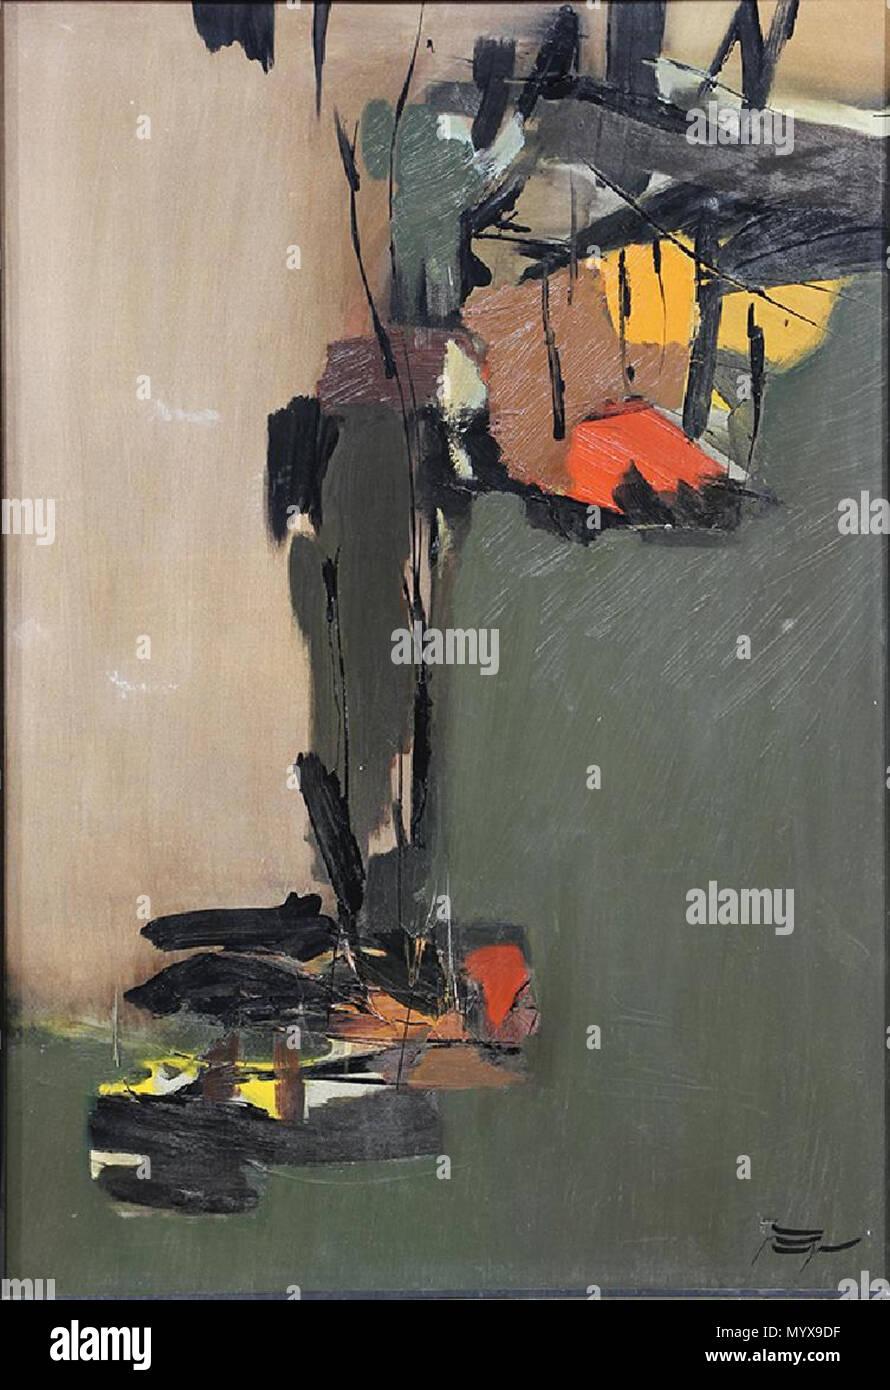 Großzügig 22x28 Rahmen Galerie - Benutzerdefinierte Bilderrahmen ...